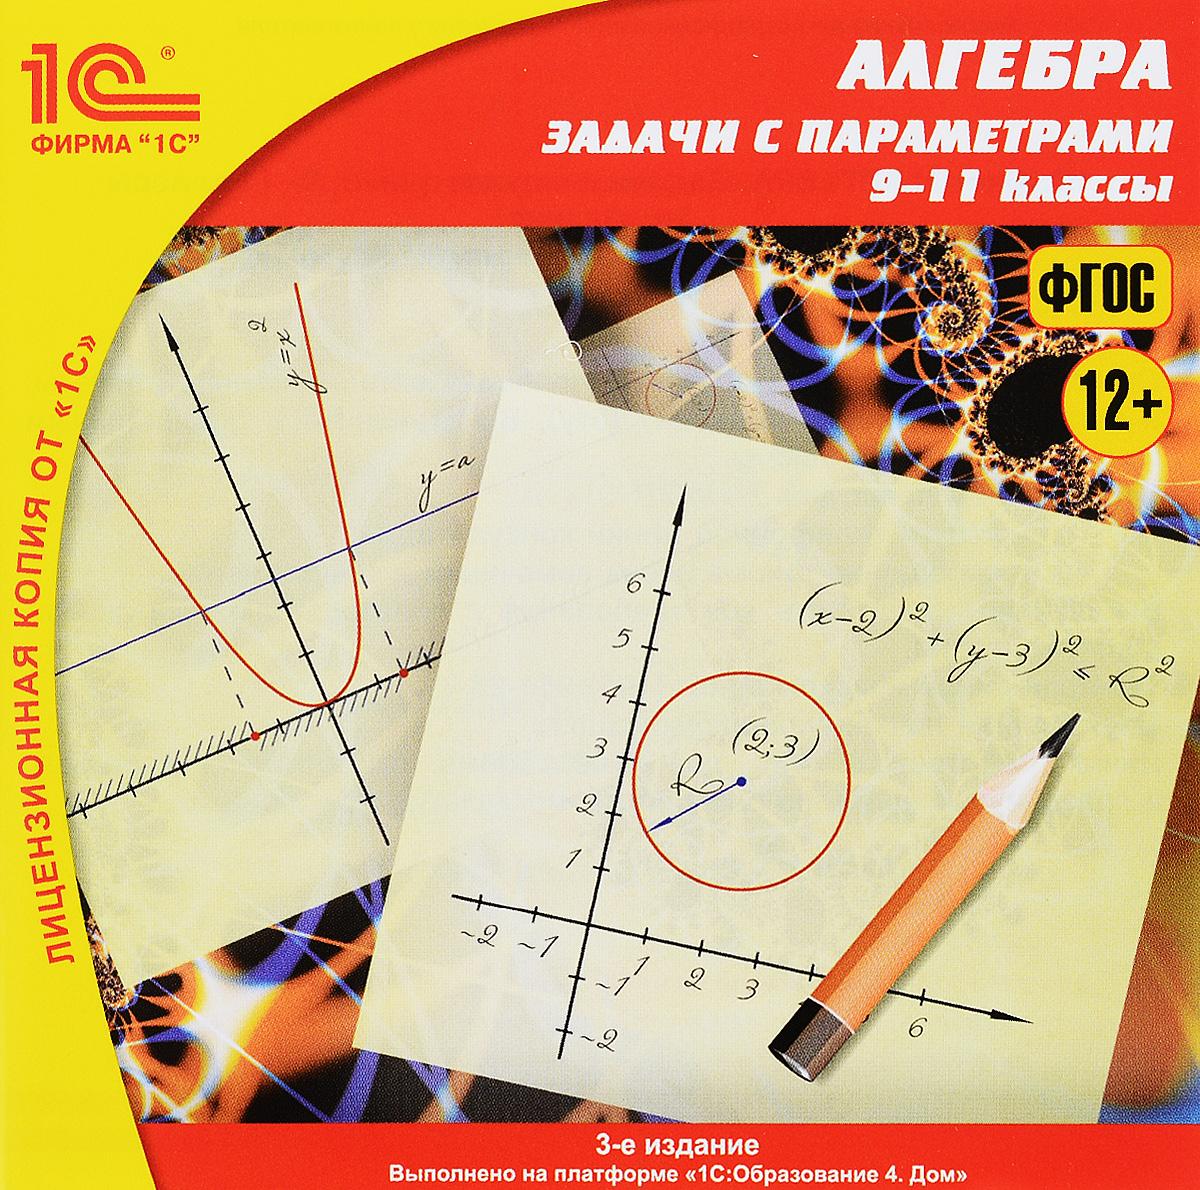 1С:Школа. Алгебра. Задачи с параметрами 9-11 классы (3 издание)